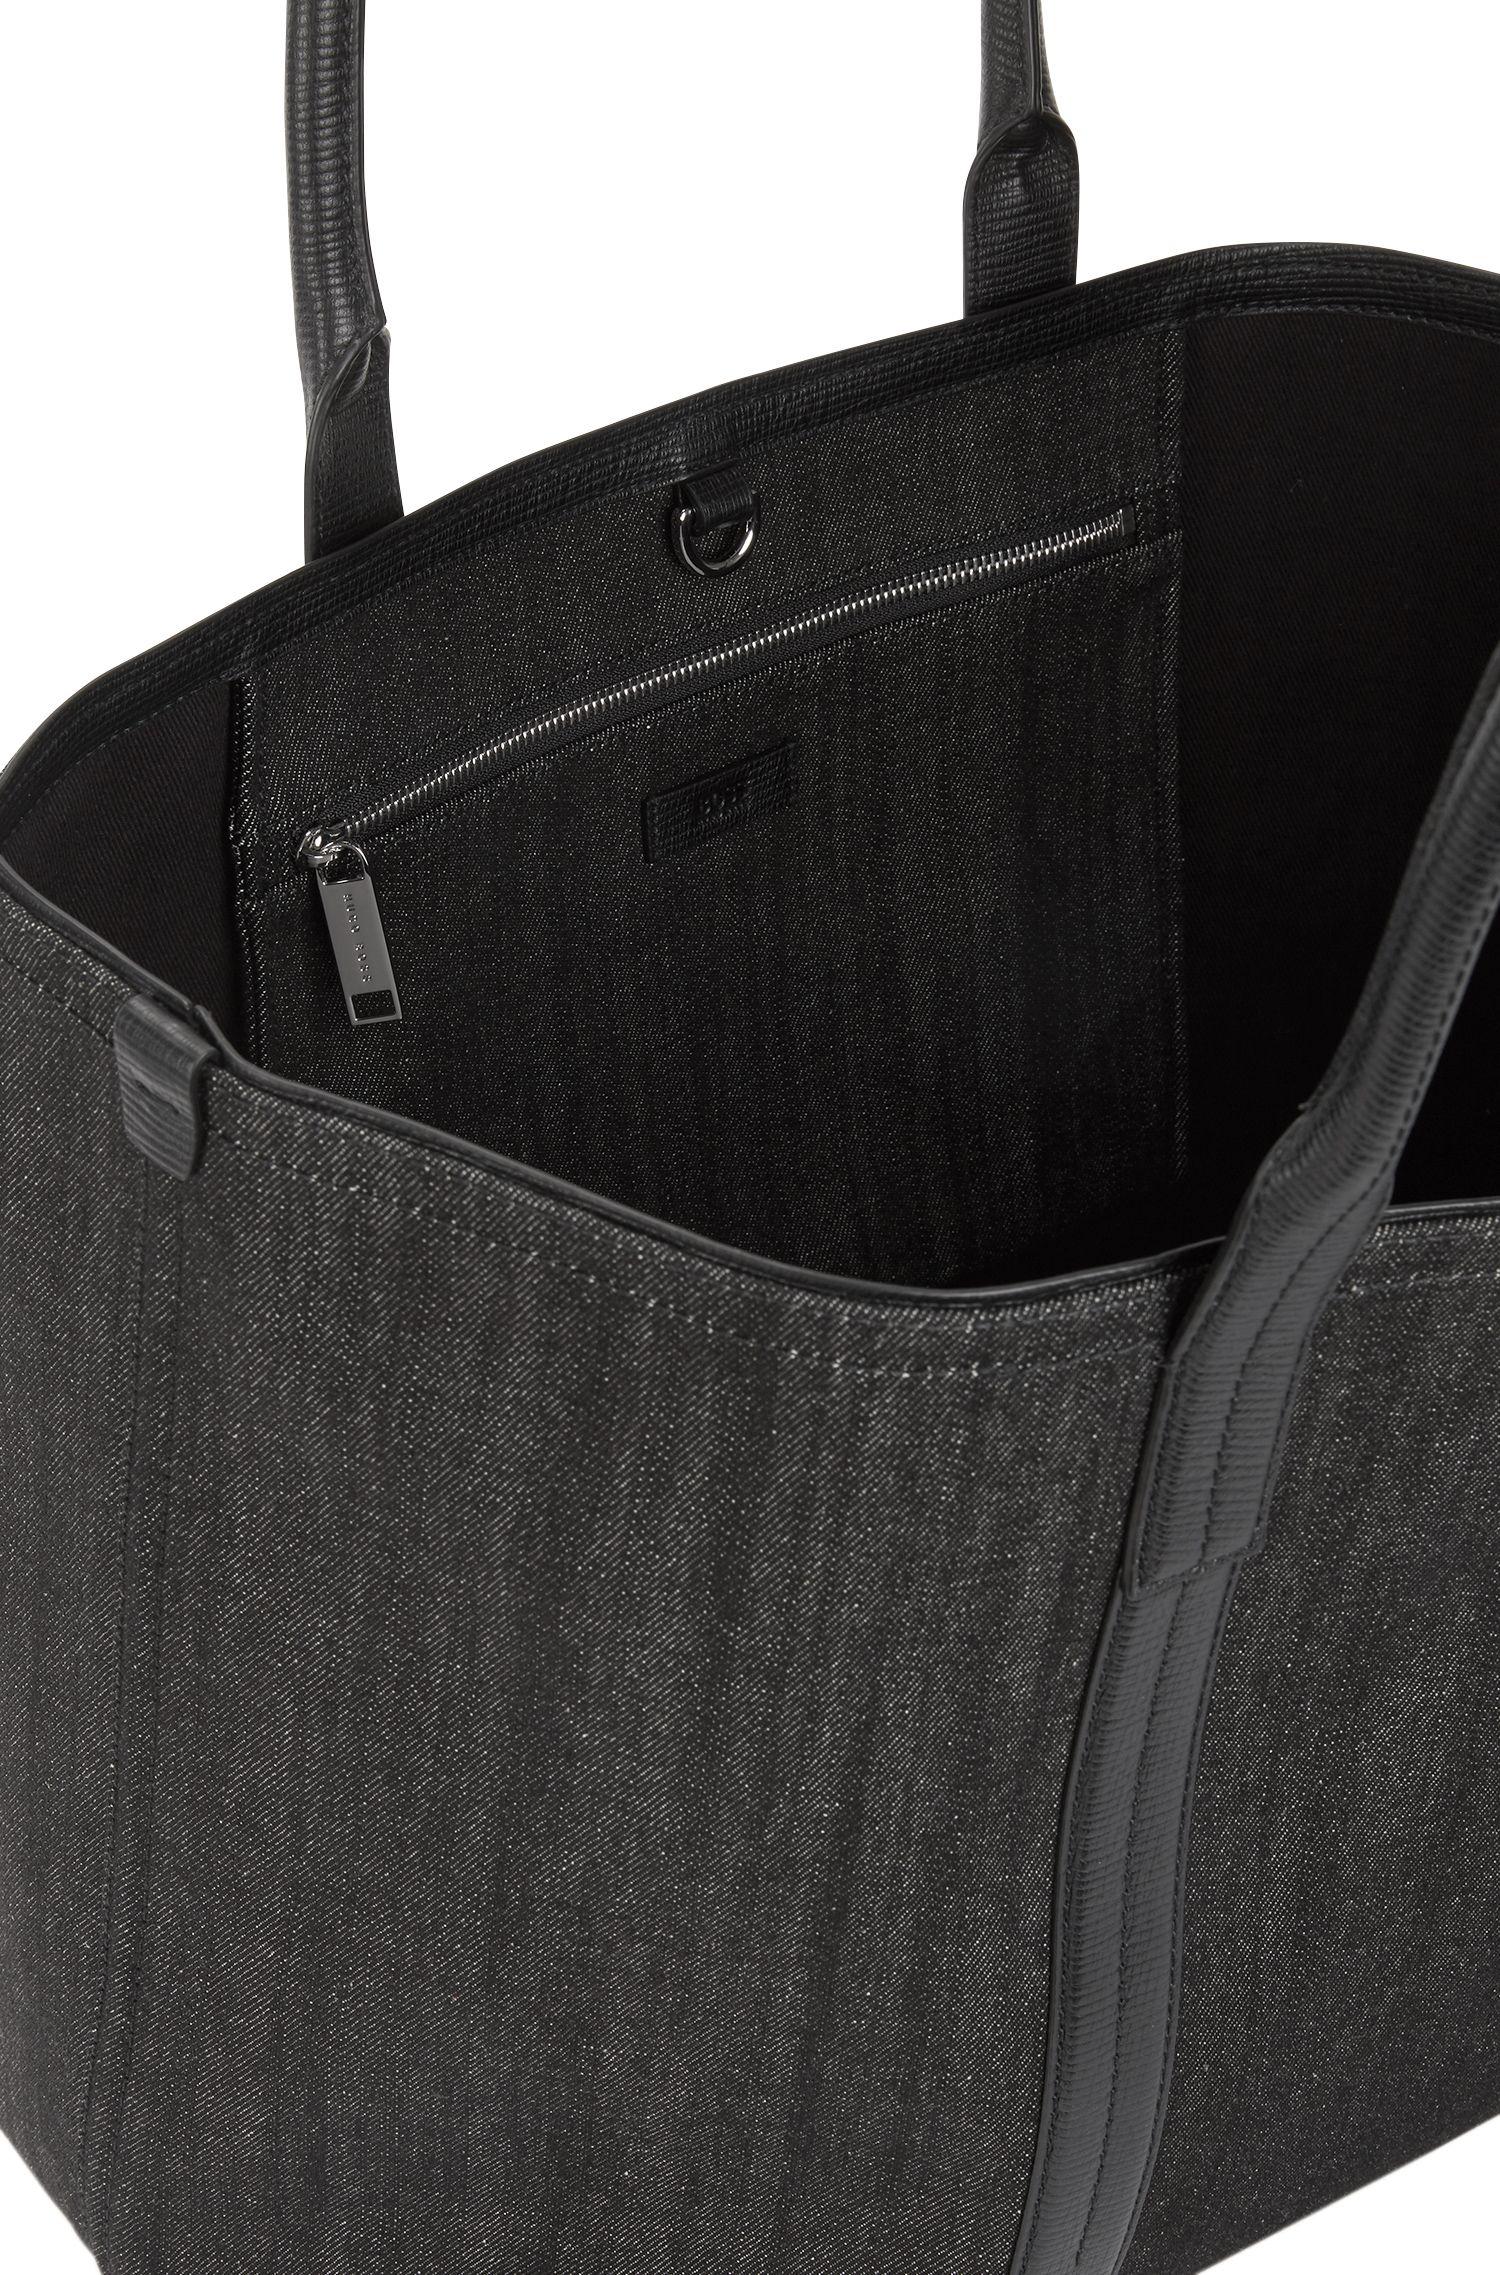 Tote Bag aus italienischem Denim mit Lederbesatz